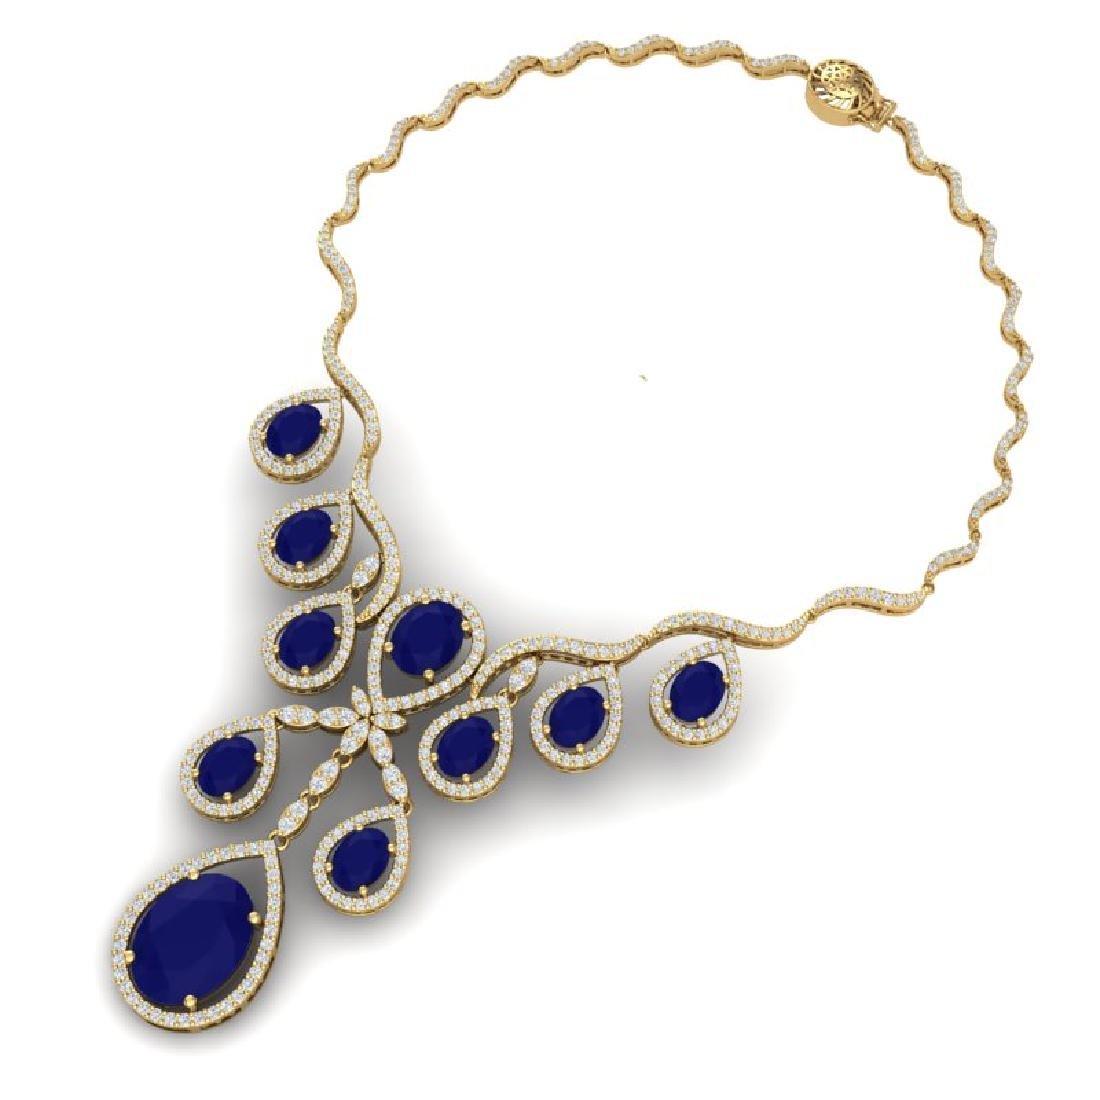 37.66 CTW Royalty Sapphire & VS Diamond Necklace 18K - 3